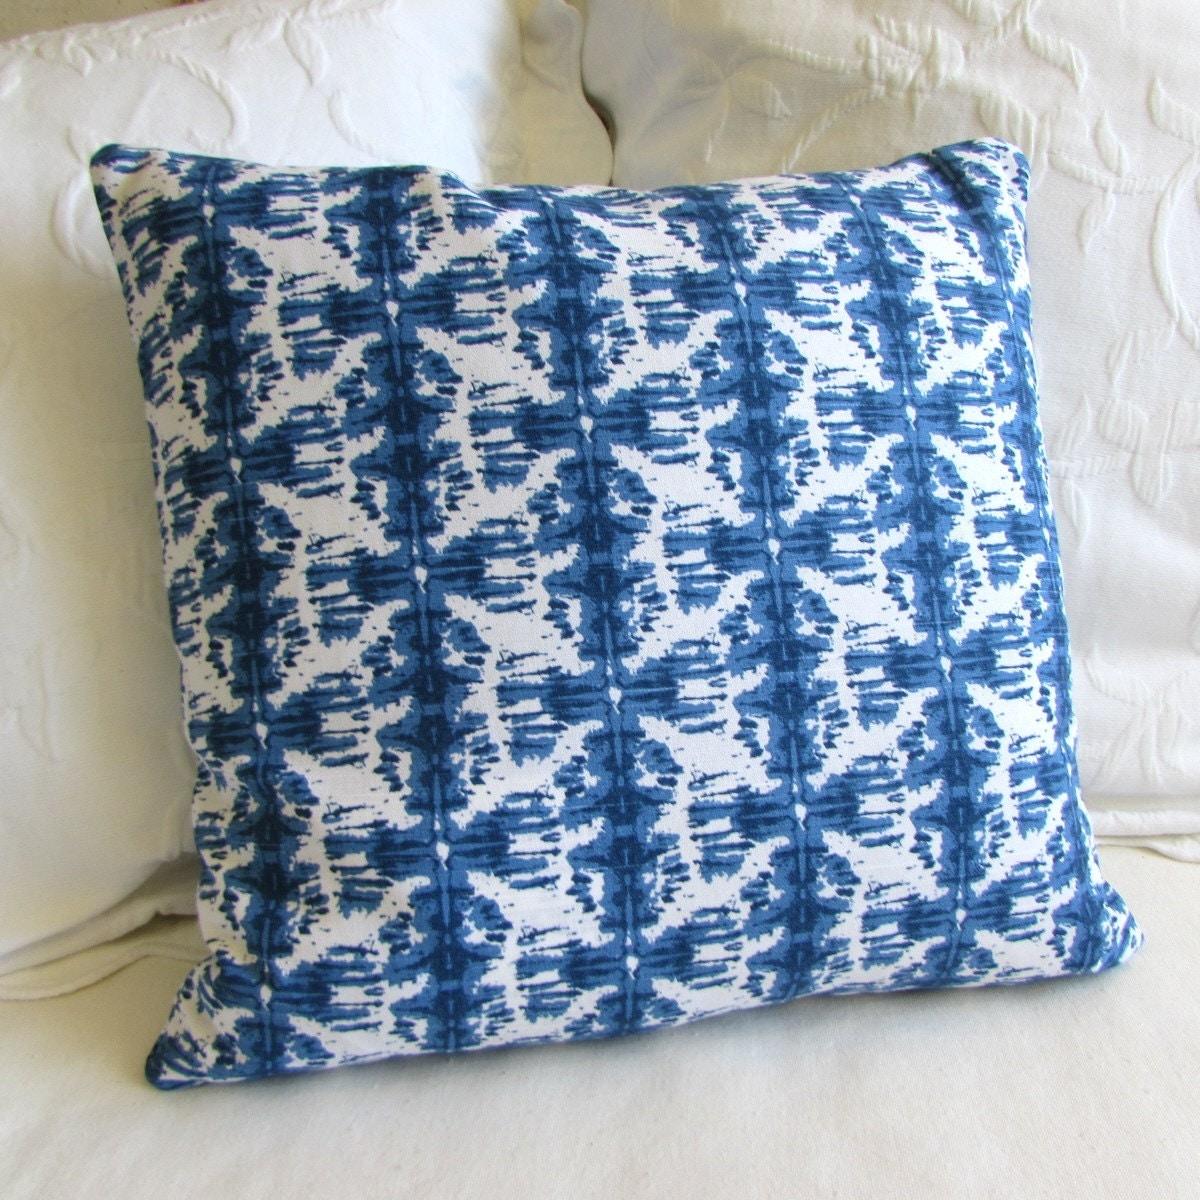 NOBU PACIFIC decorative pillow cover 18x18 20x20 22x22 24x24